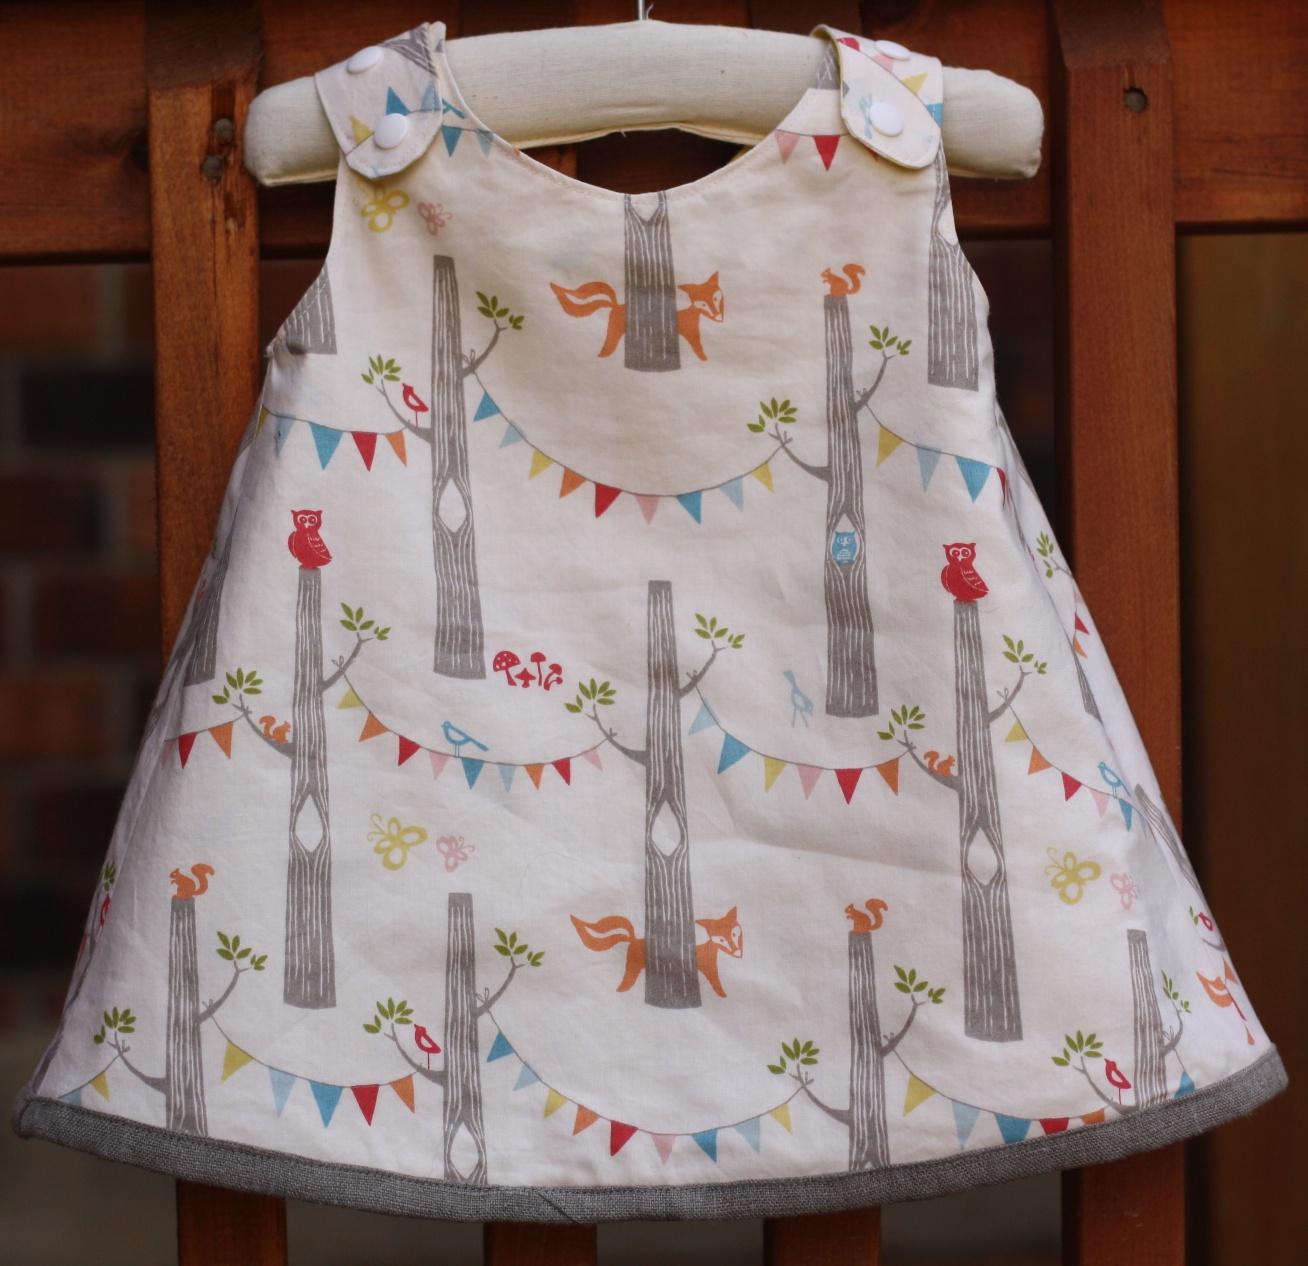 Stitched Together Serena Baby Dress